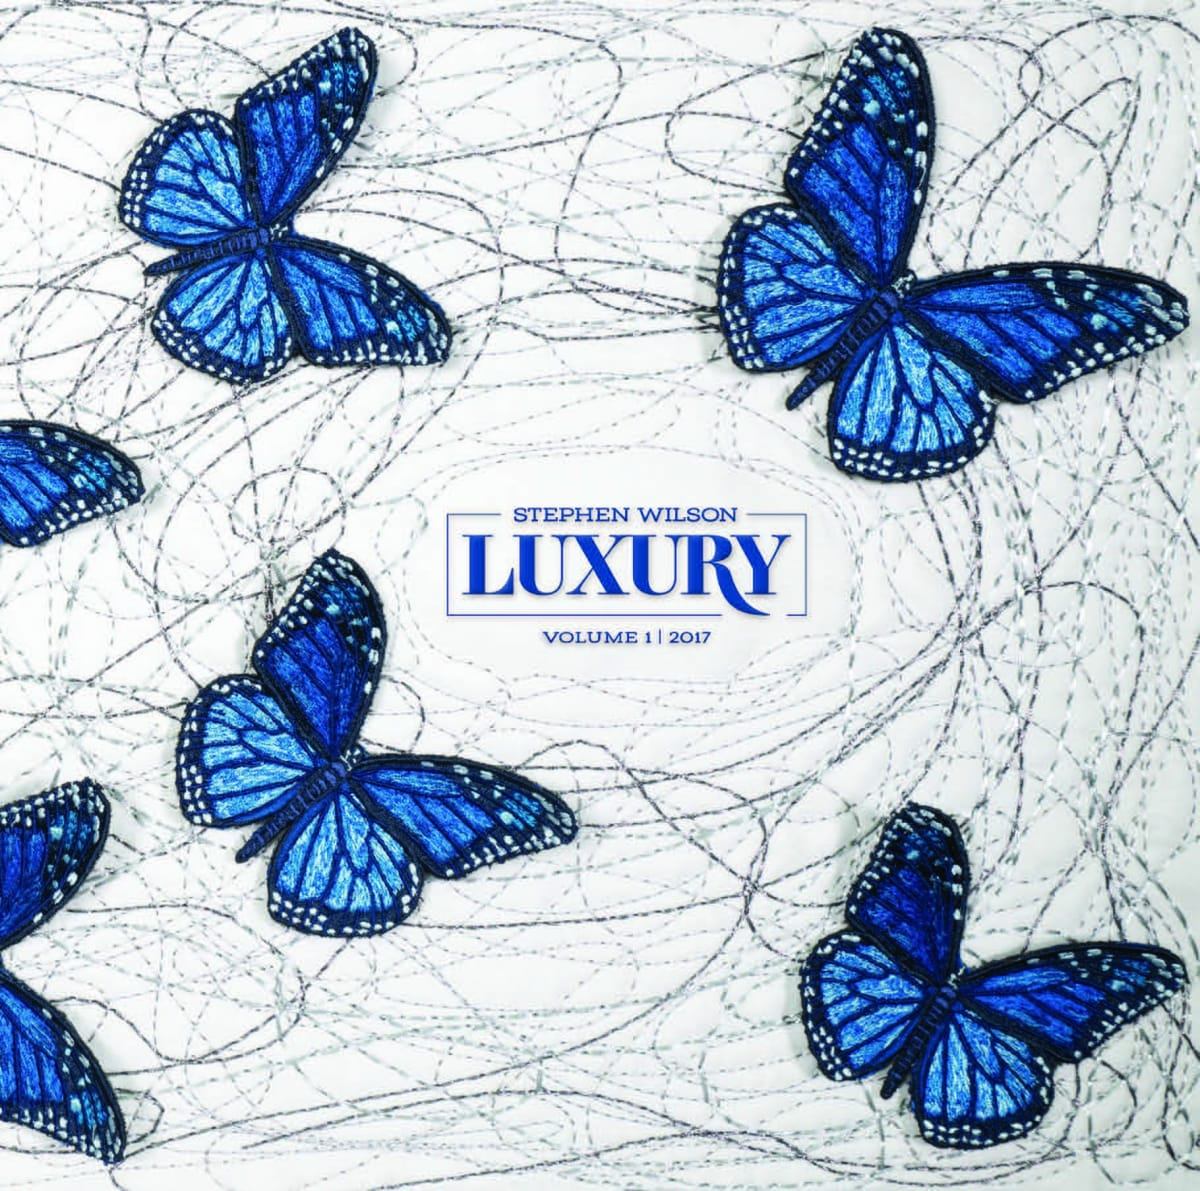 Luxury Volume 1